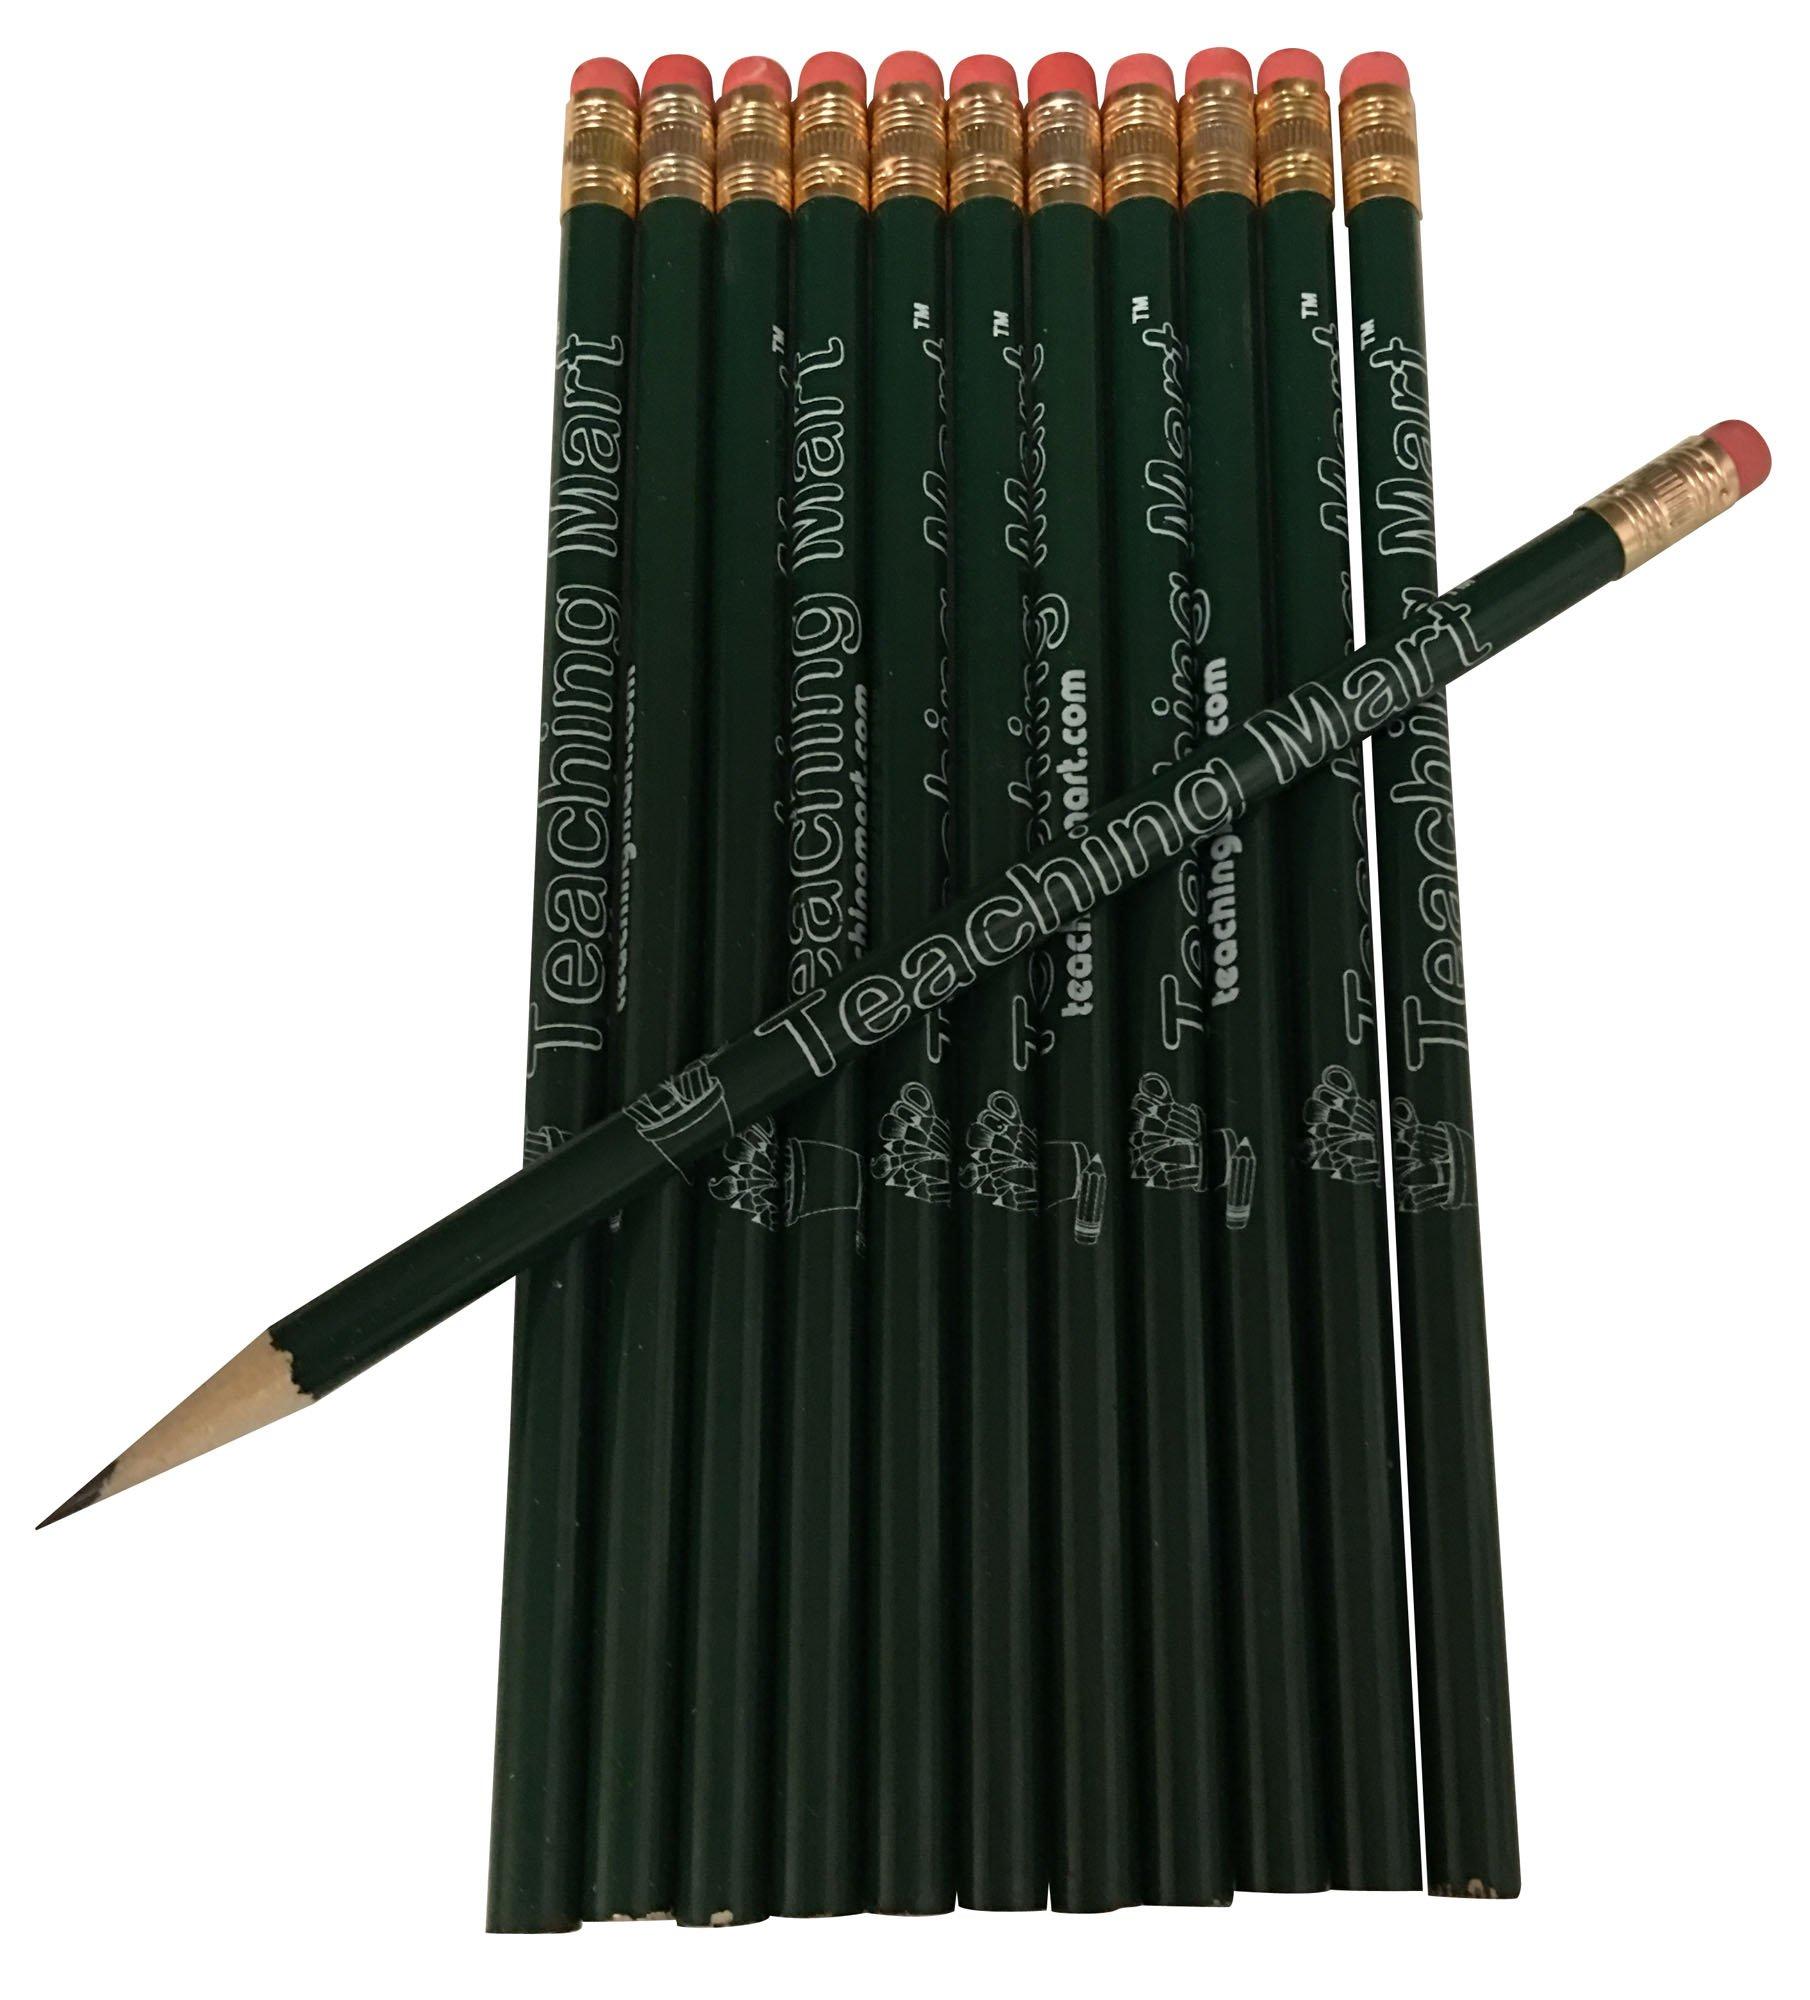 Heavy Duty Electric Pencil Sharpener with 12-Pack TeachingMart Pencils by TeachingMart